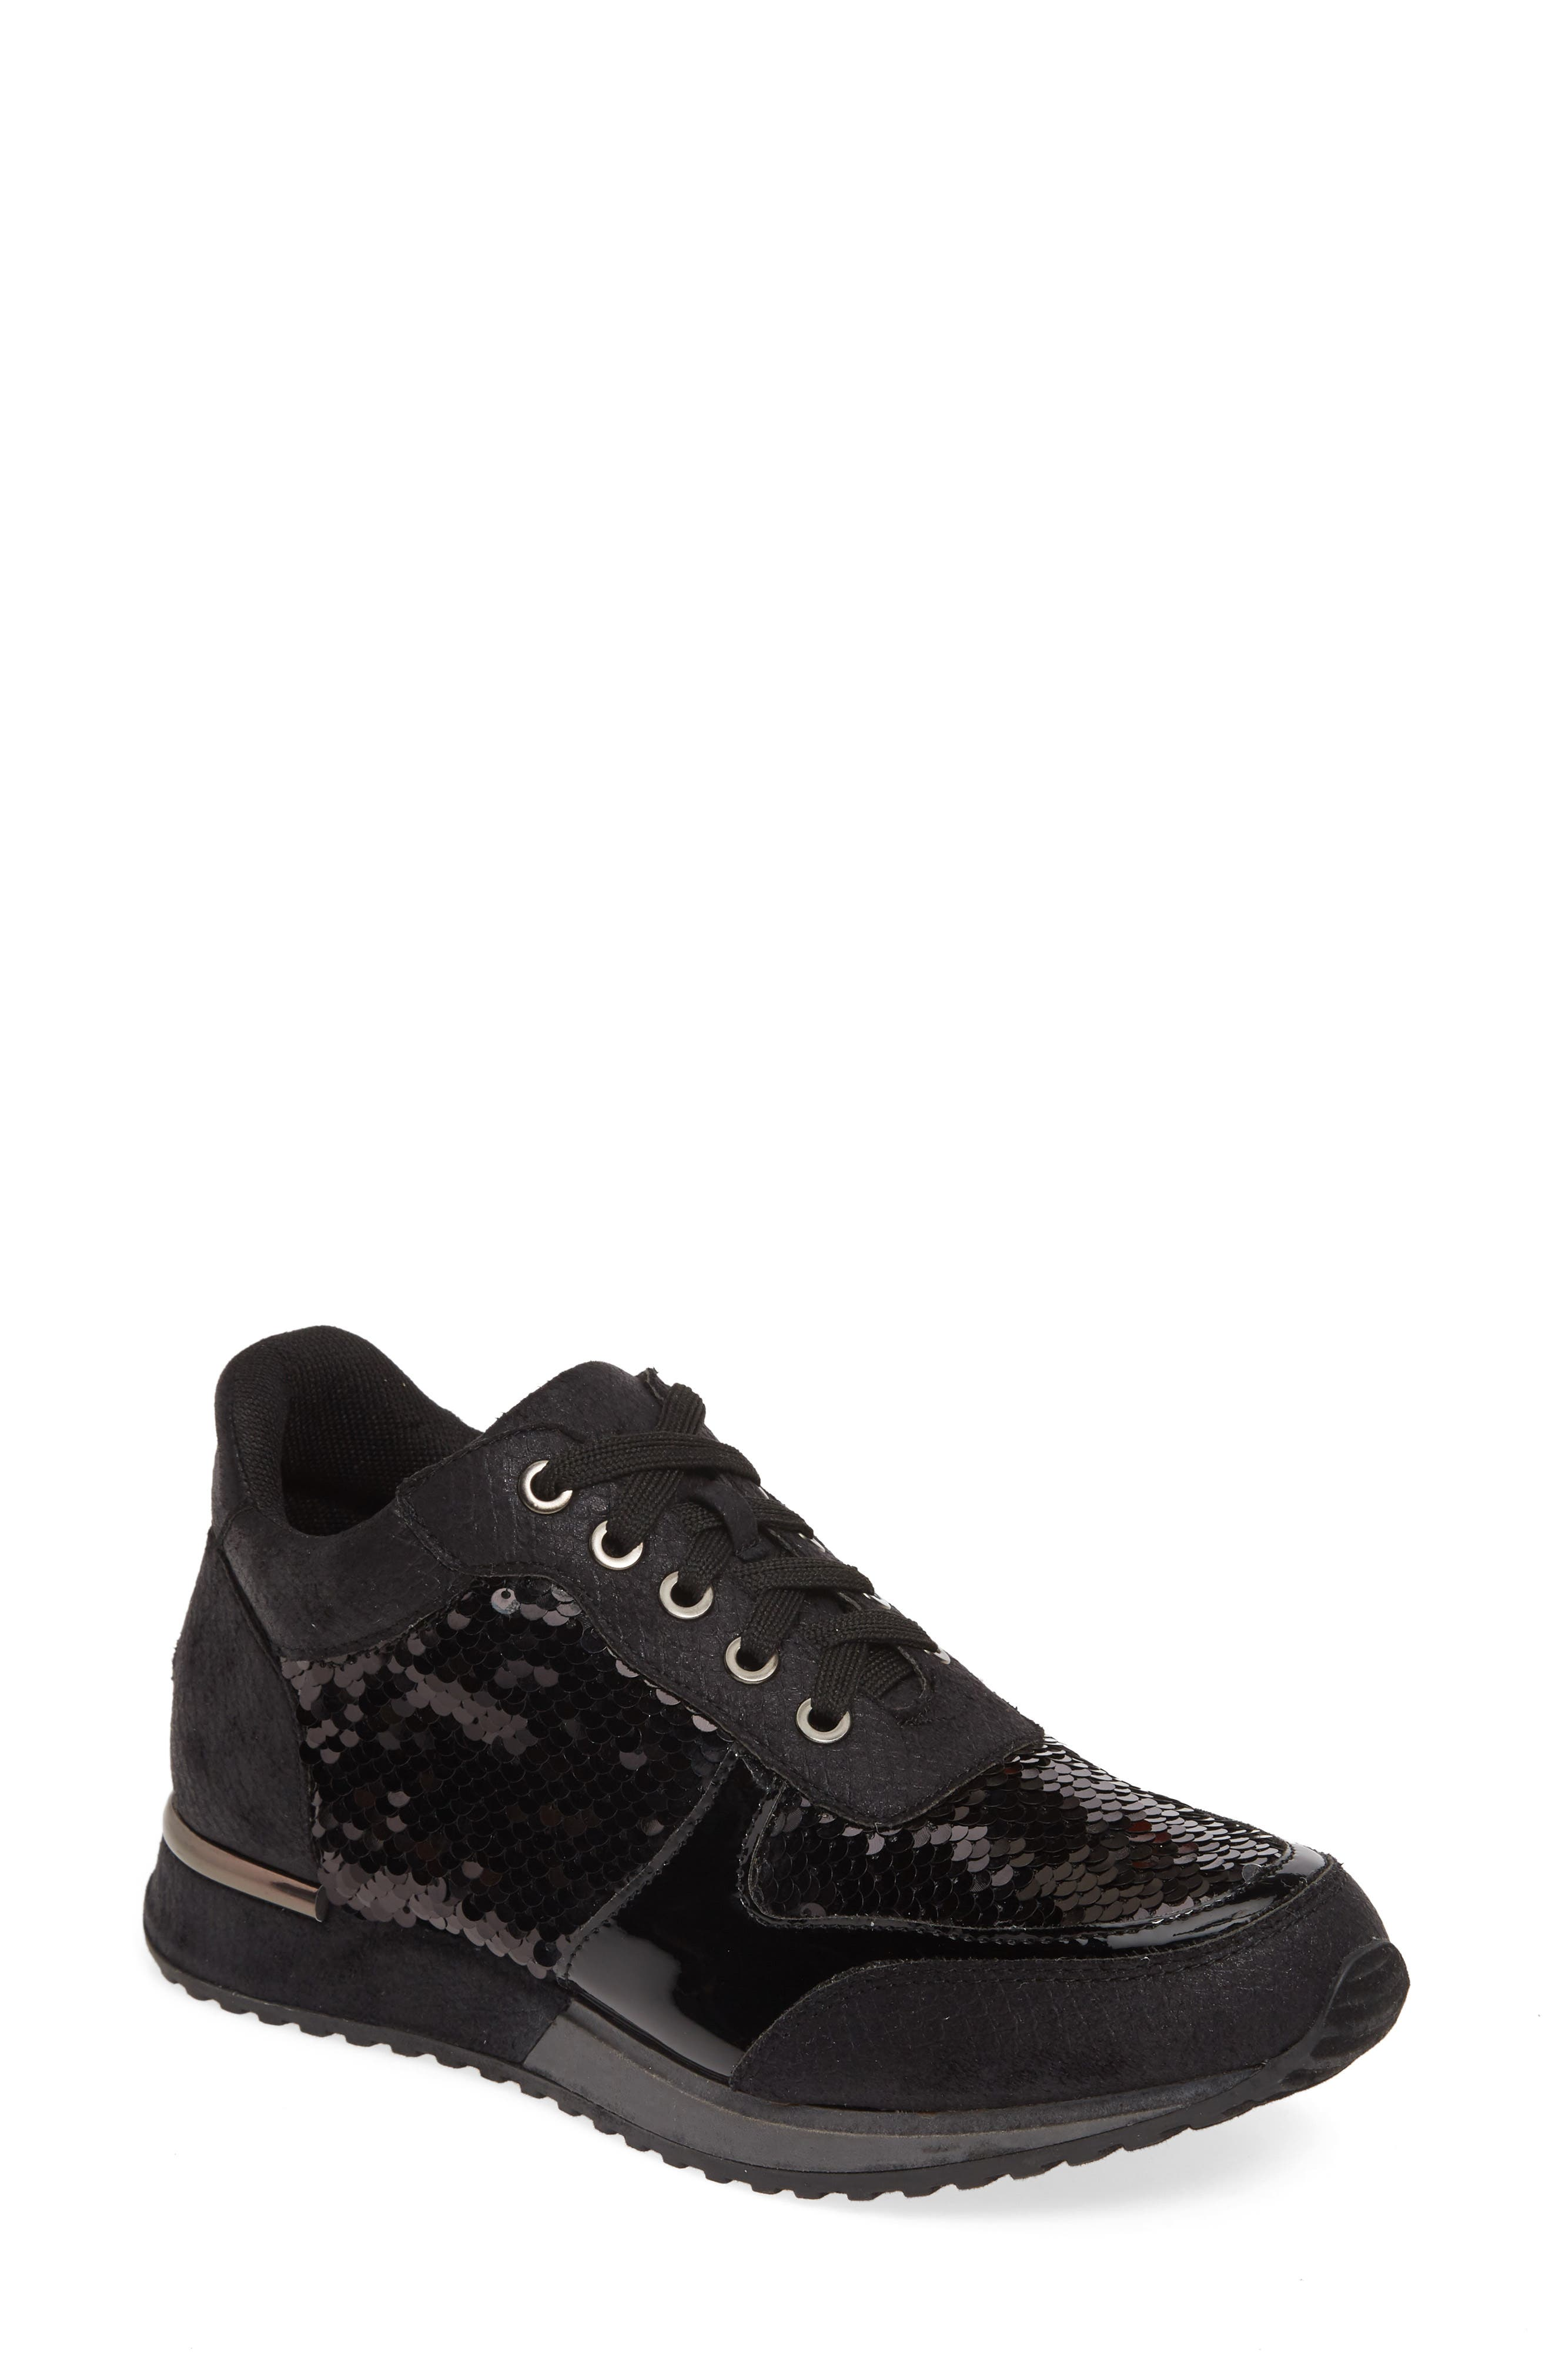 Lauren Lorraine Axel Embellished Sneaker, Black